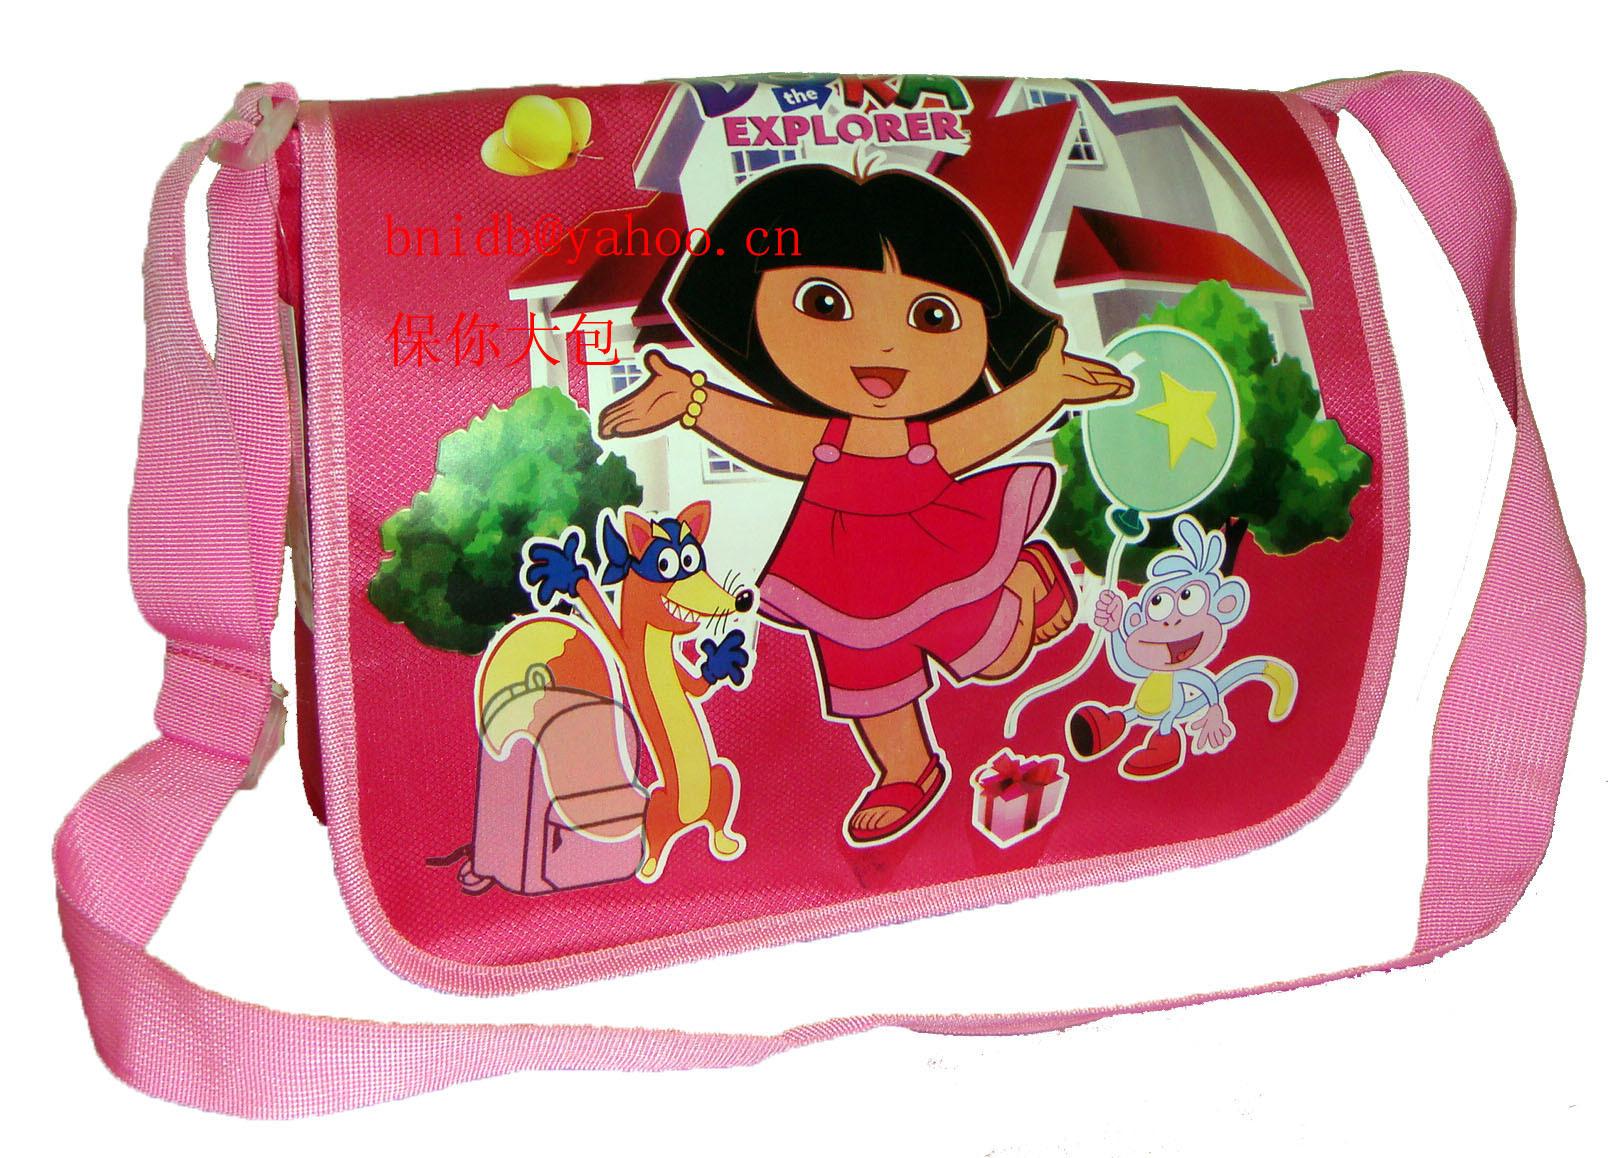 Dora dora one shoulder school bag girls messenger bag casual bag primary school students cartoon school bag(China (Mainland))